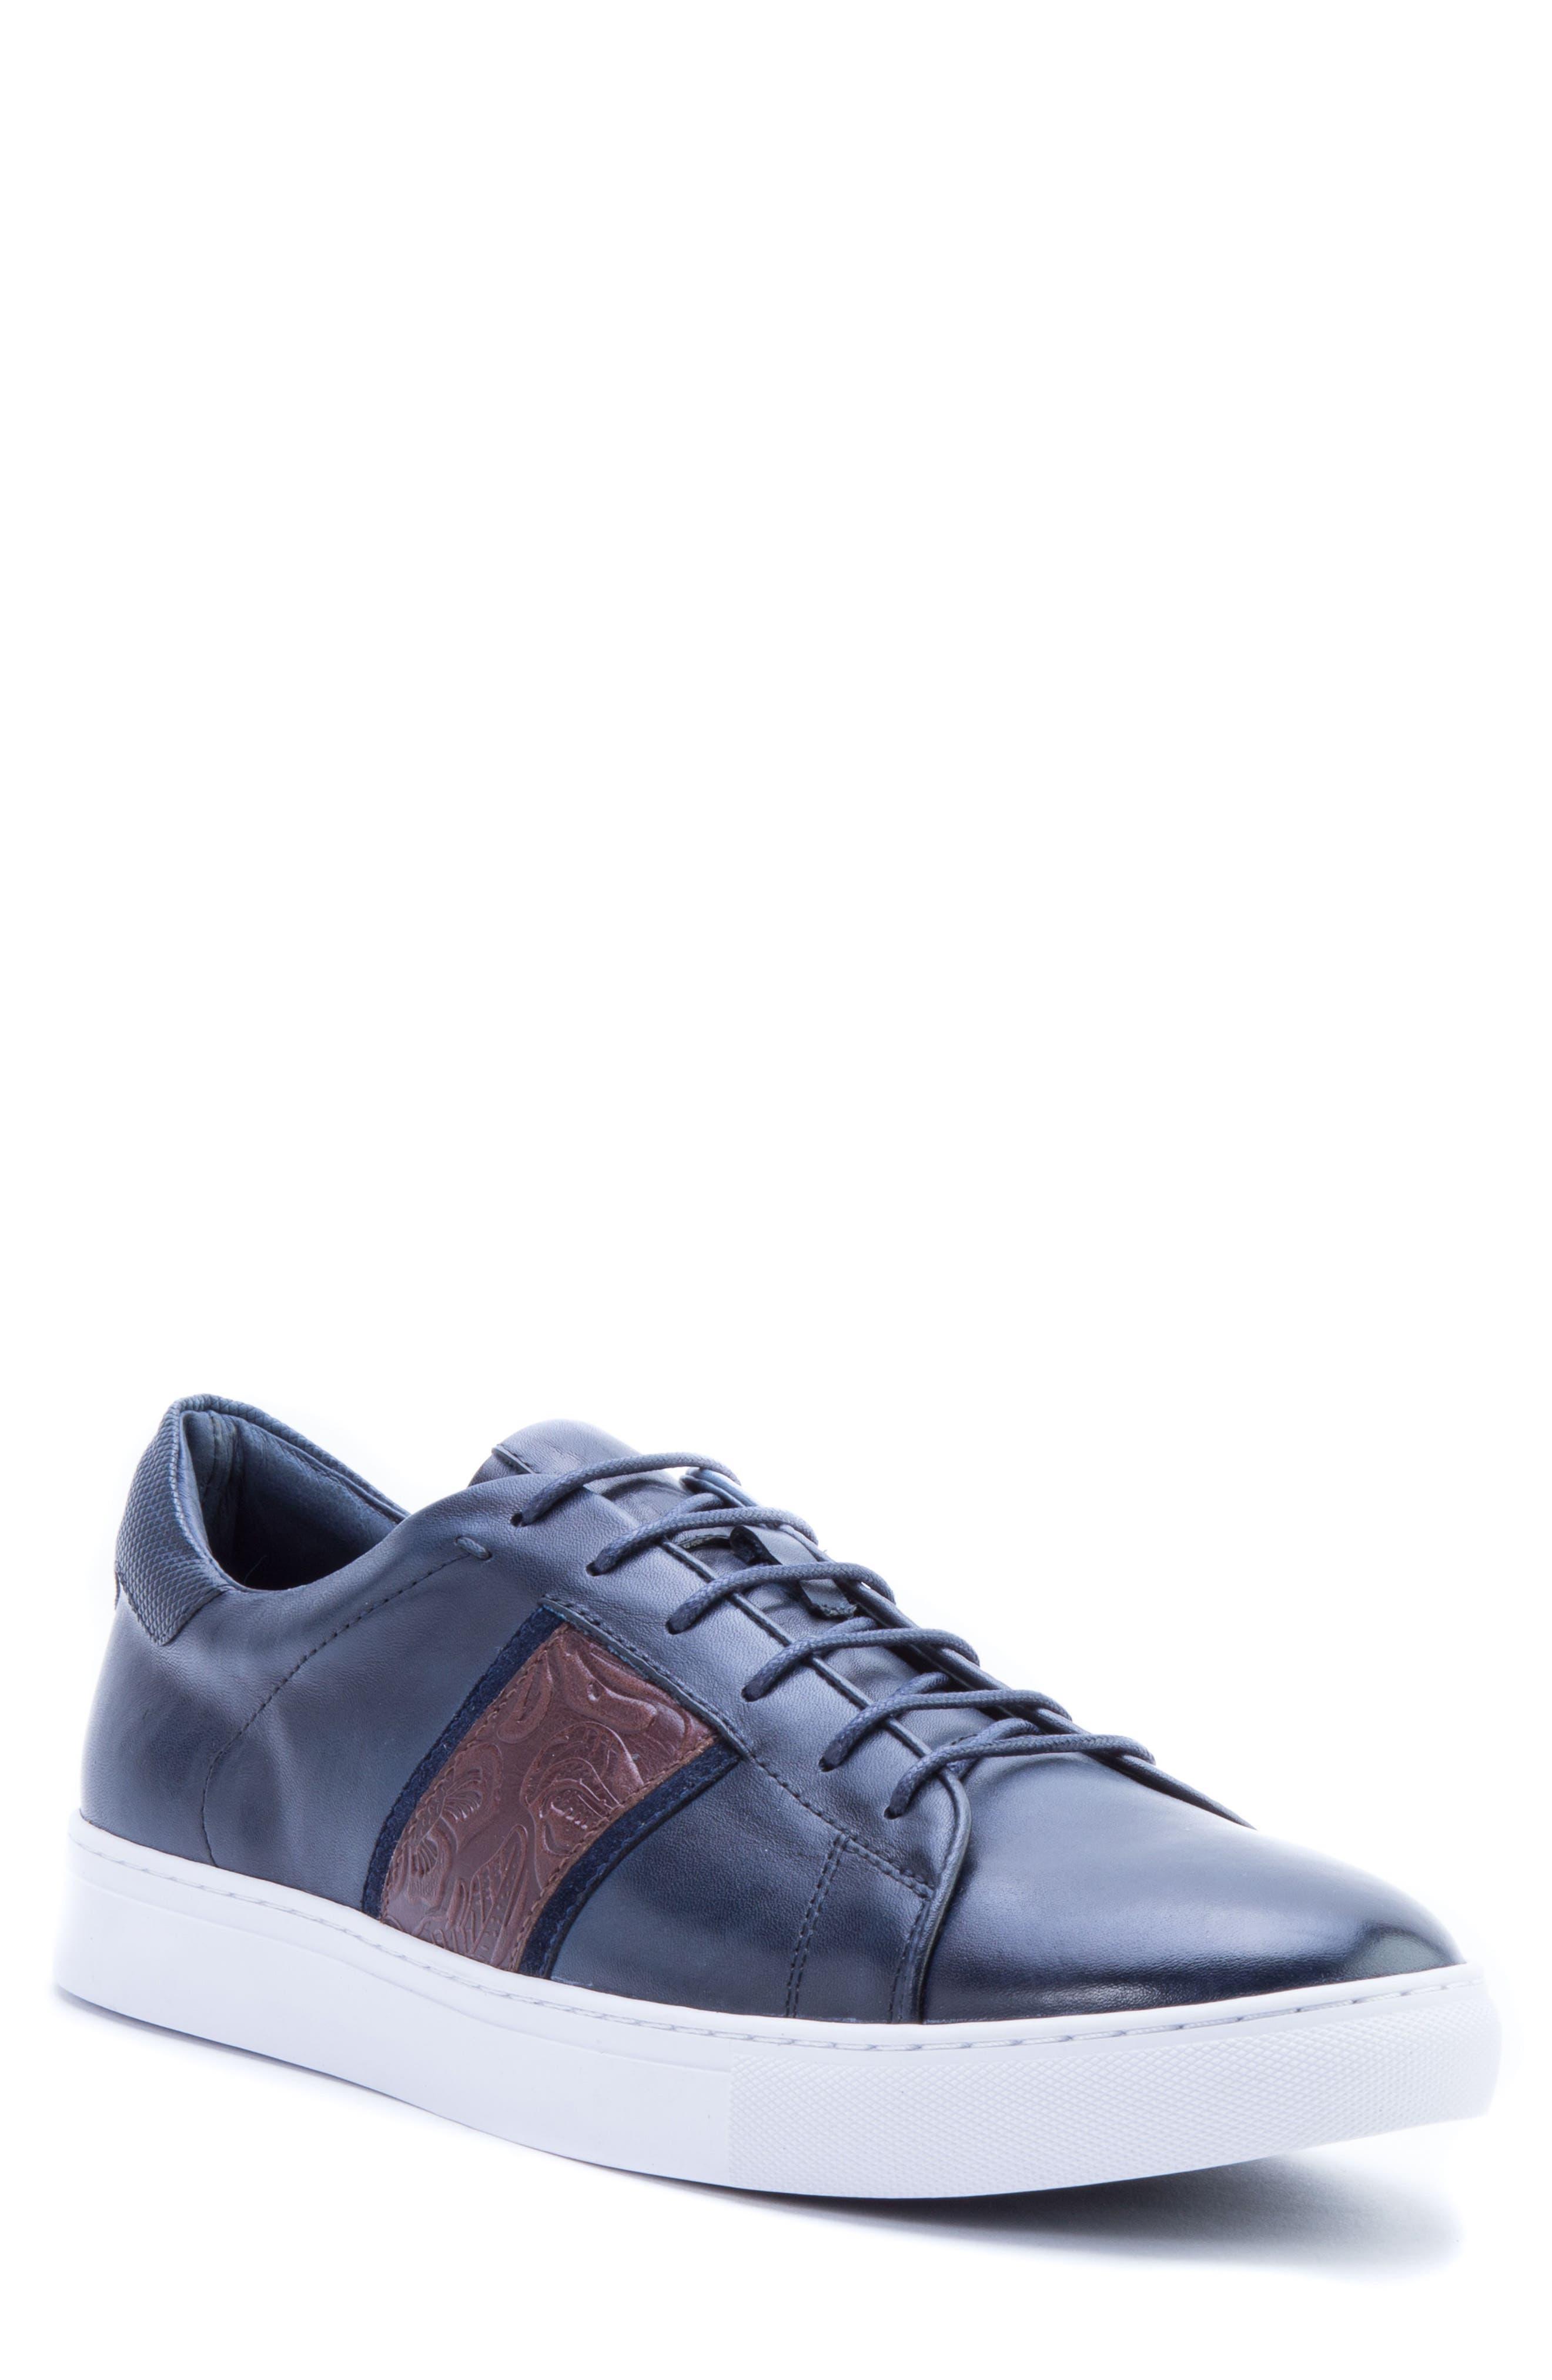 Robert Graham Men's Delgado Embossed Sneaker pfknoe0c